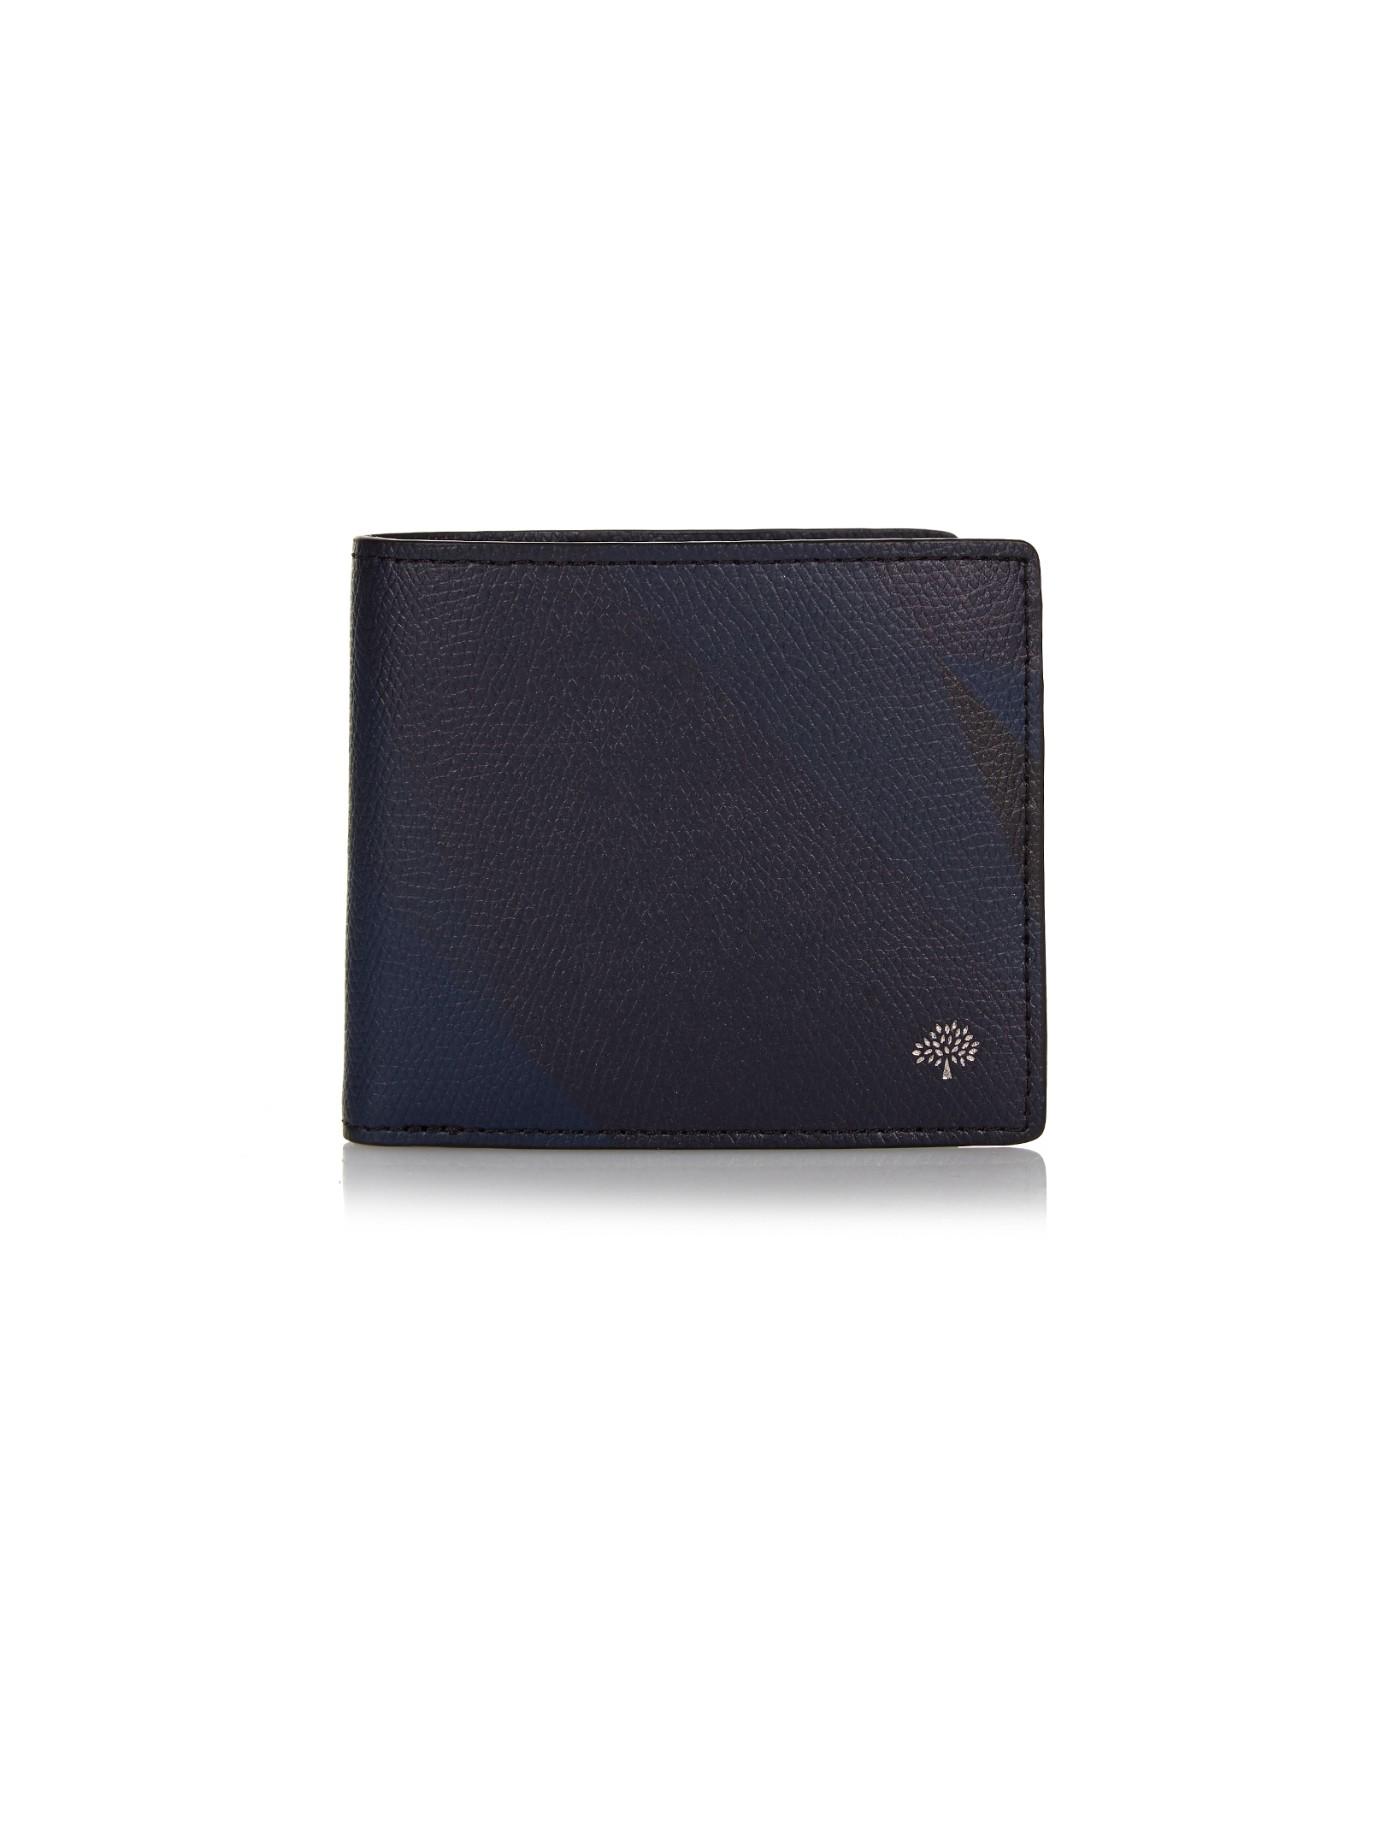 fdd9afce1e61 ... canada mulberry dazzle camo print leather wallet in blue for men lyst  99a5d dfa23